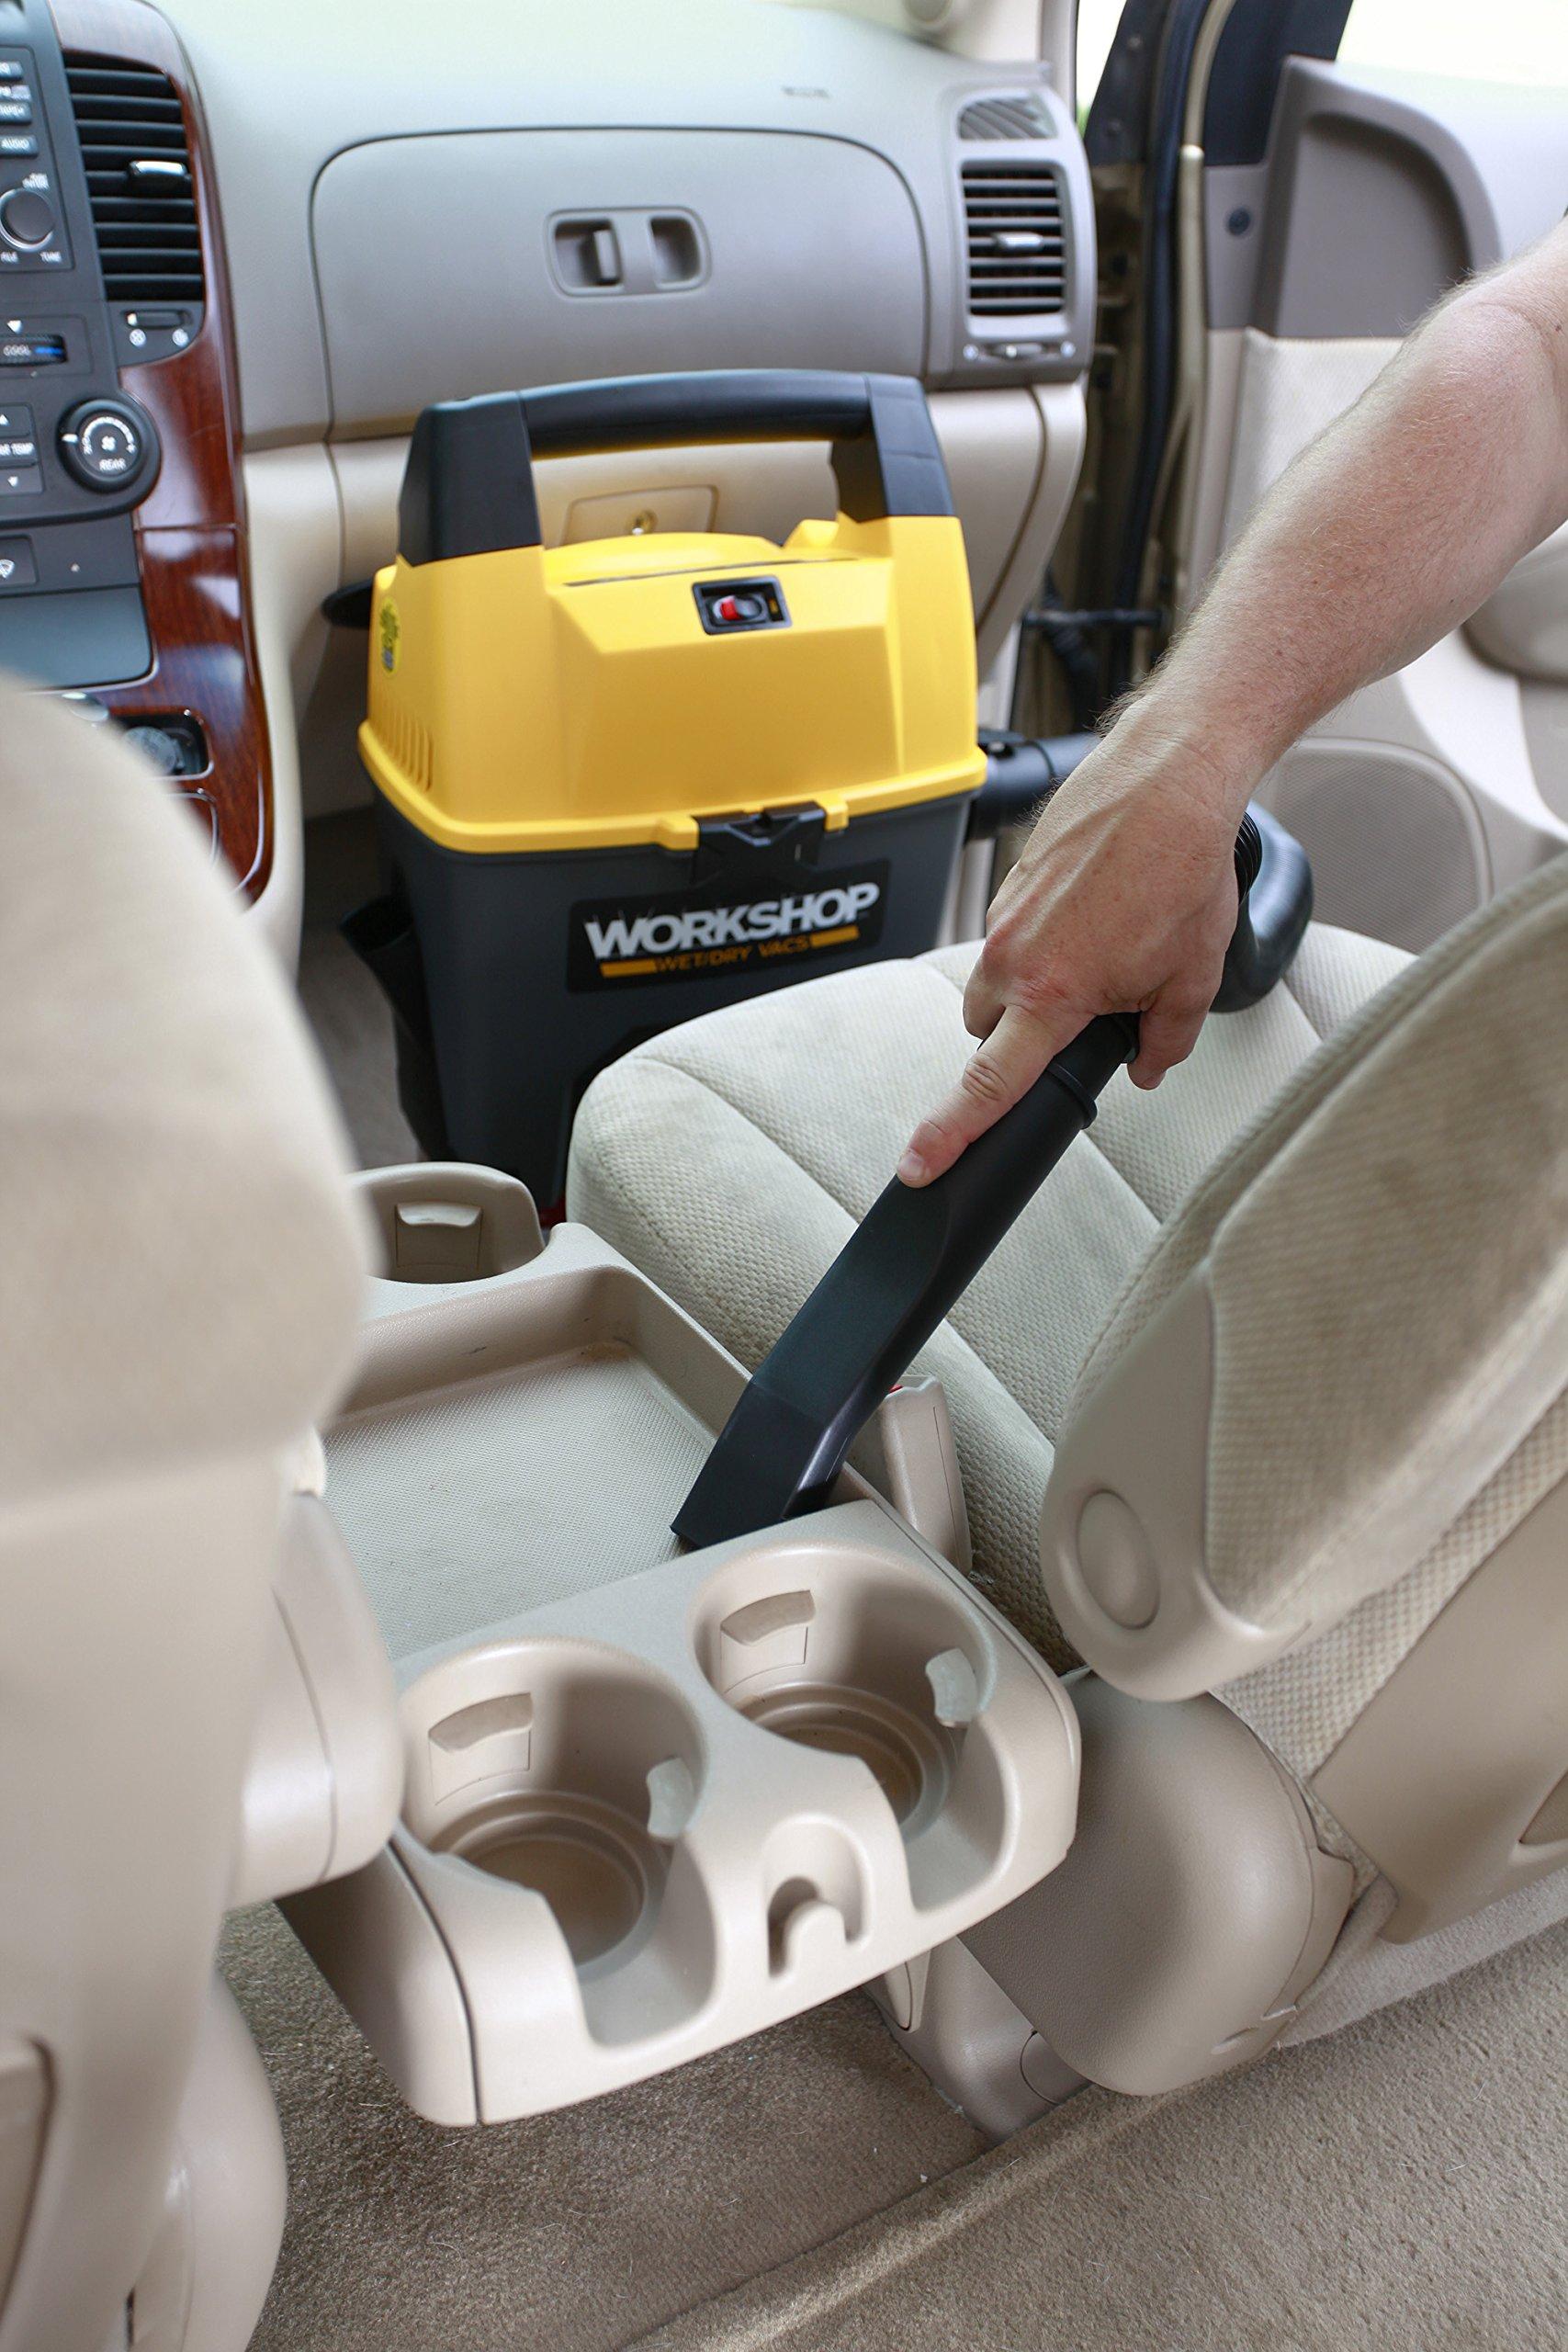 WORKSHOP Wet Dry Vac WS0301VA Portable Wet Dry Vacuum Cleaner For Car, 3-Gallon Wet Dry Auto Vacuum Cleaner, 3.5 Peak HP Portable Auto Vacuum With Accessories For Car Cleaning by WORKSHOP Wet/Dry Vacs (Image #3)